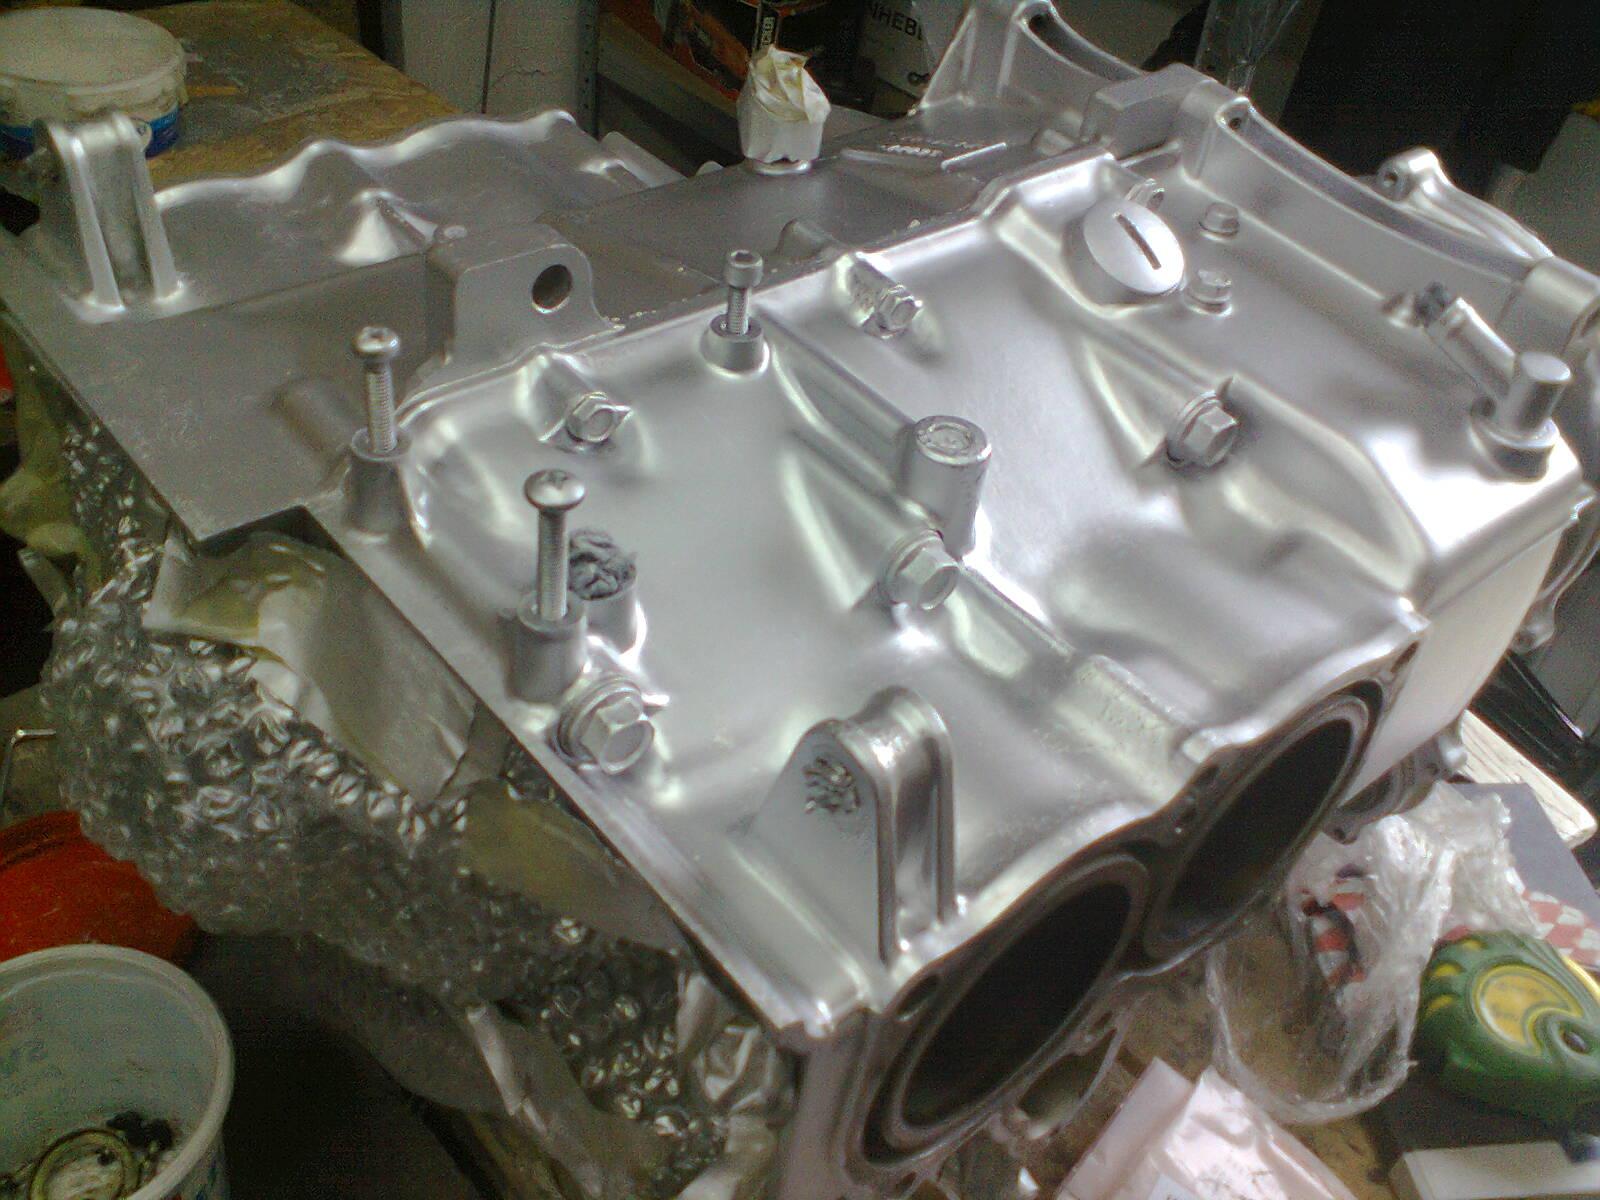 GL1100 build progress – engine repainted